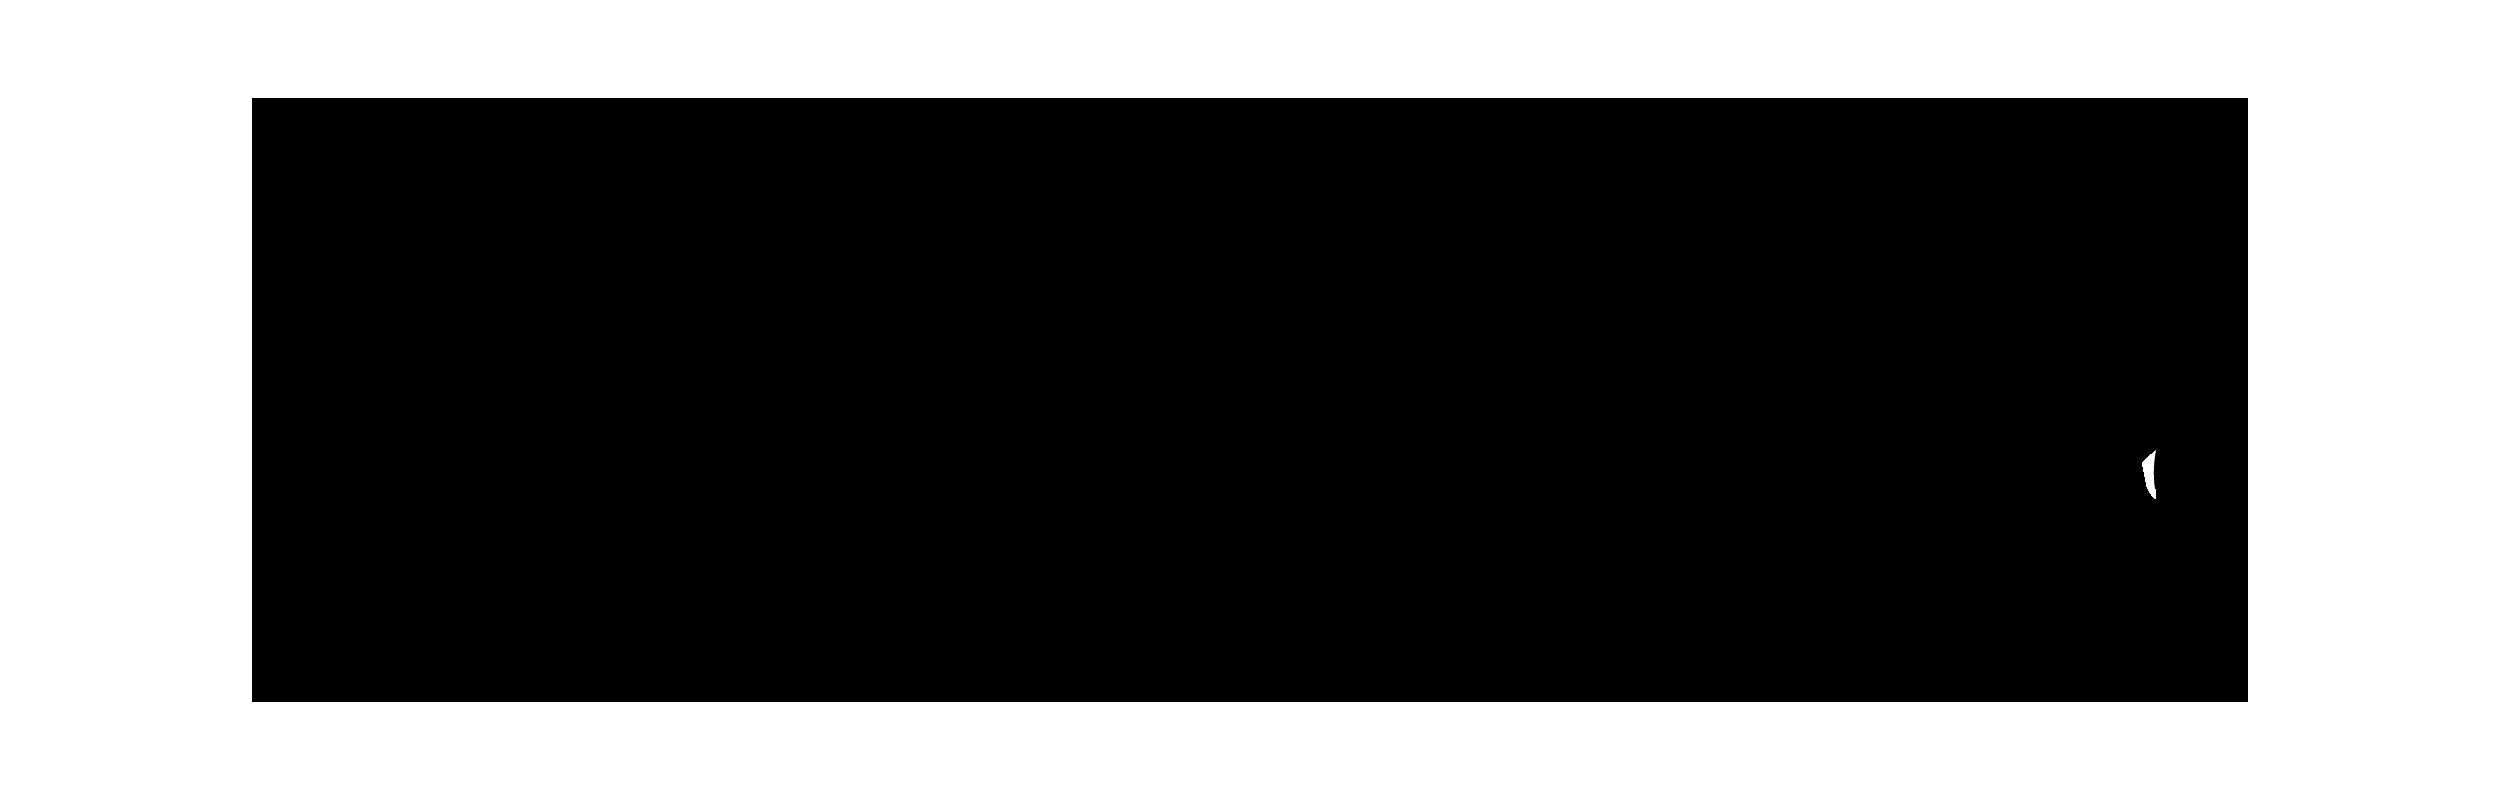 www.andaganer.com